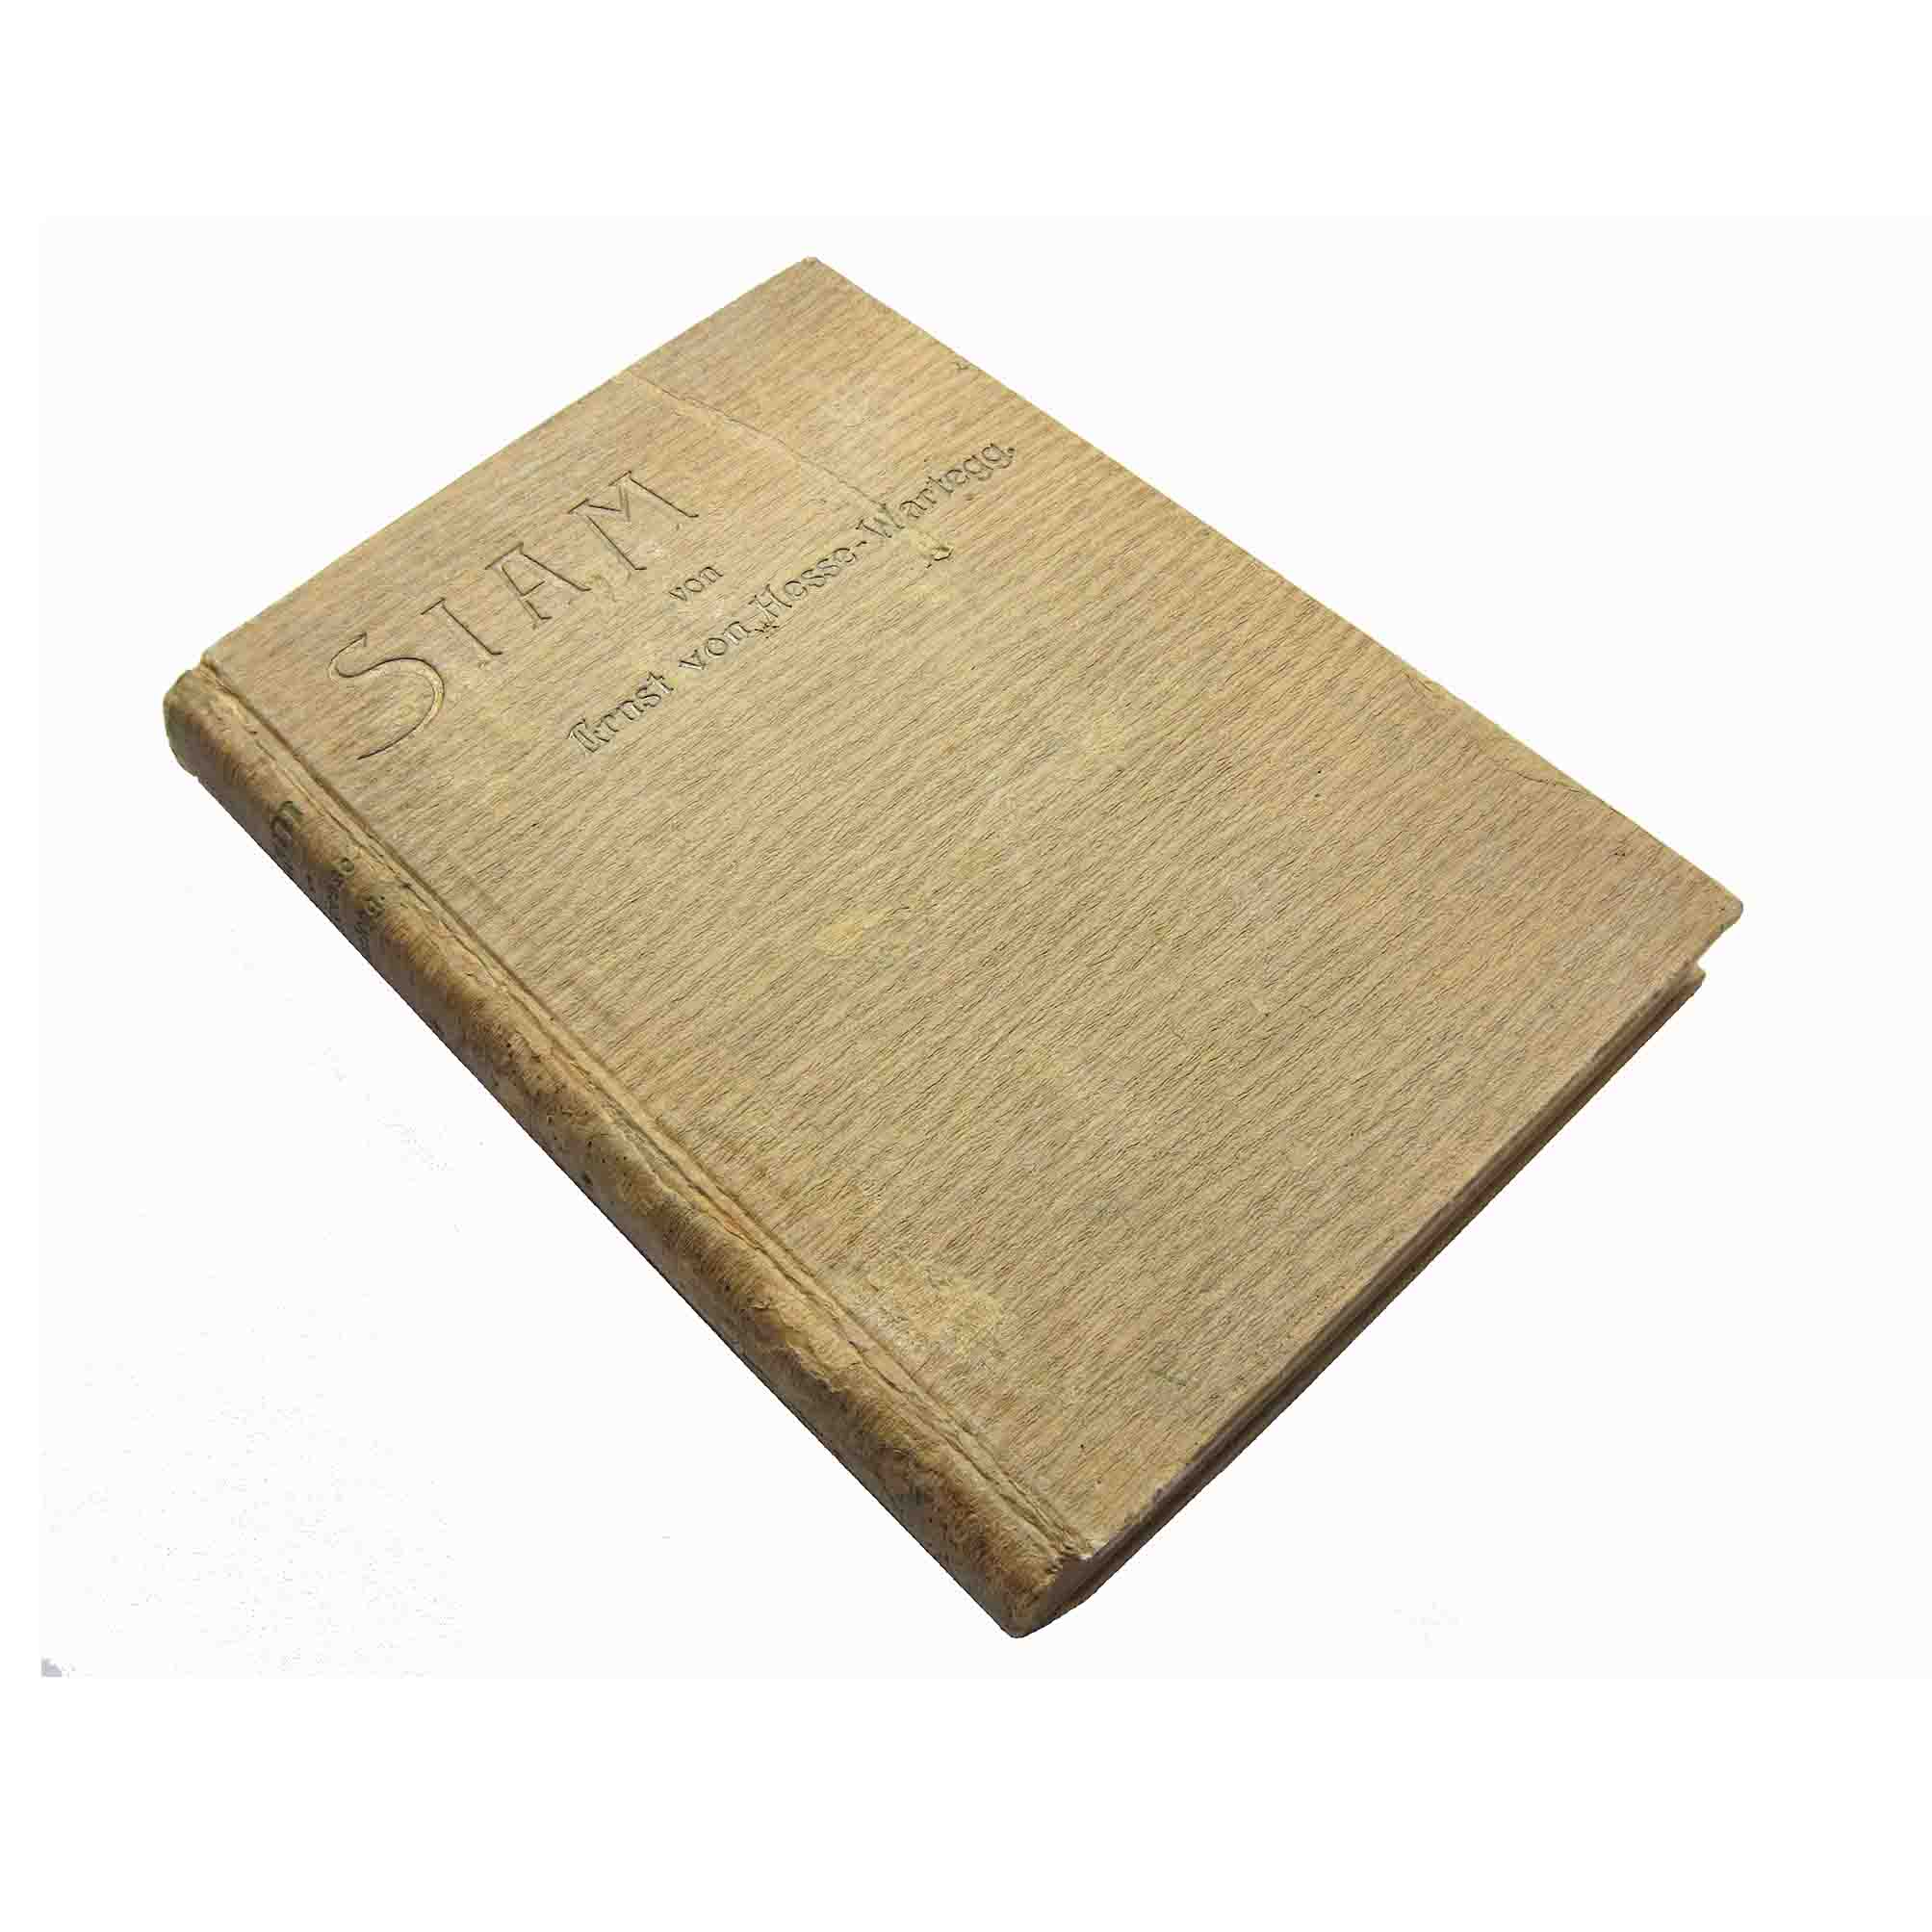 5644-Hesse-Wartegg-Siam-1899-Cover-free-N.jpg